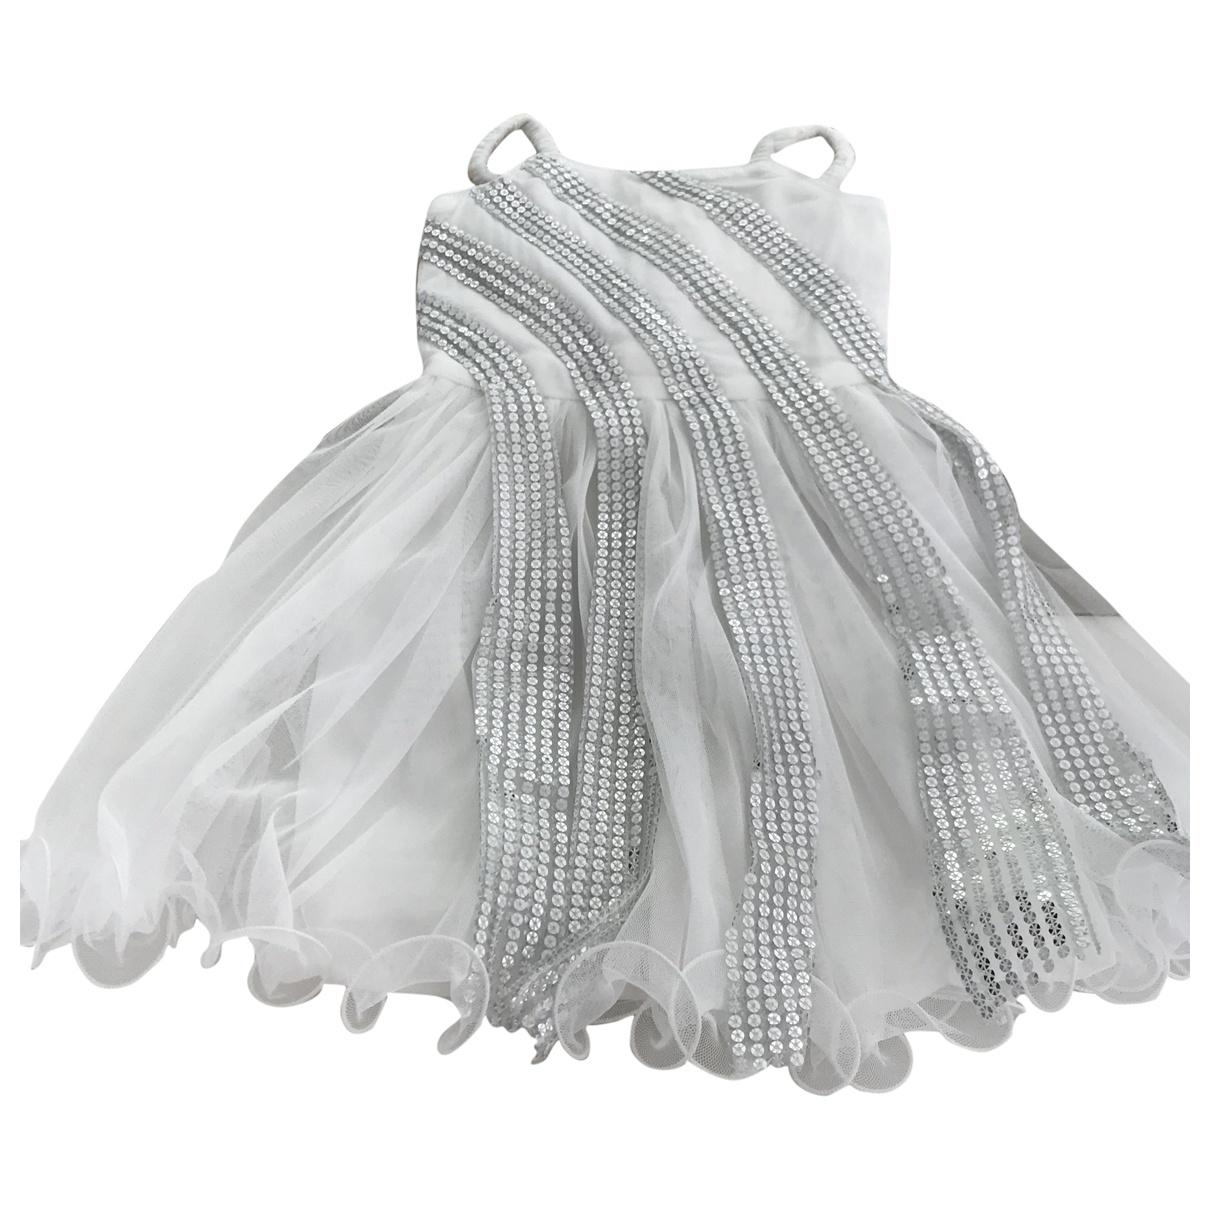 Billieblush \N White Glitter dress for Kids 5 years - up to 108cm FR